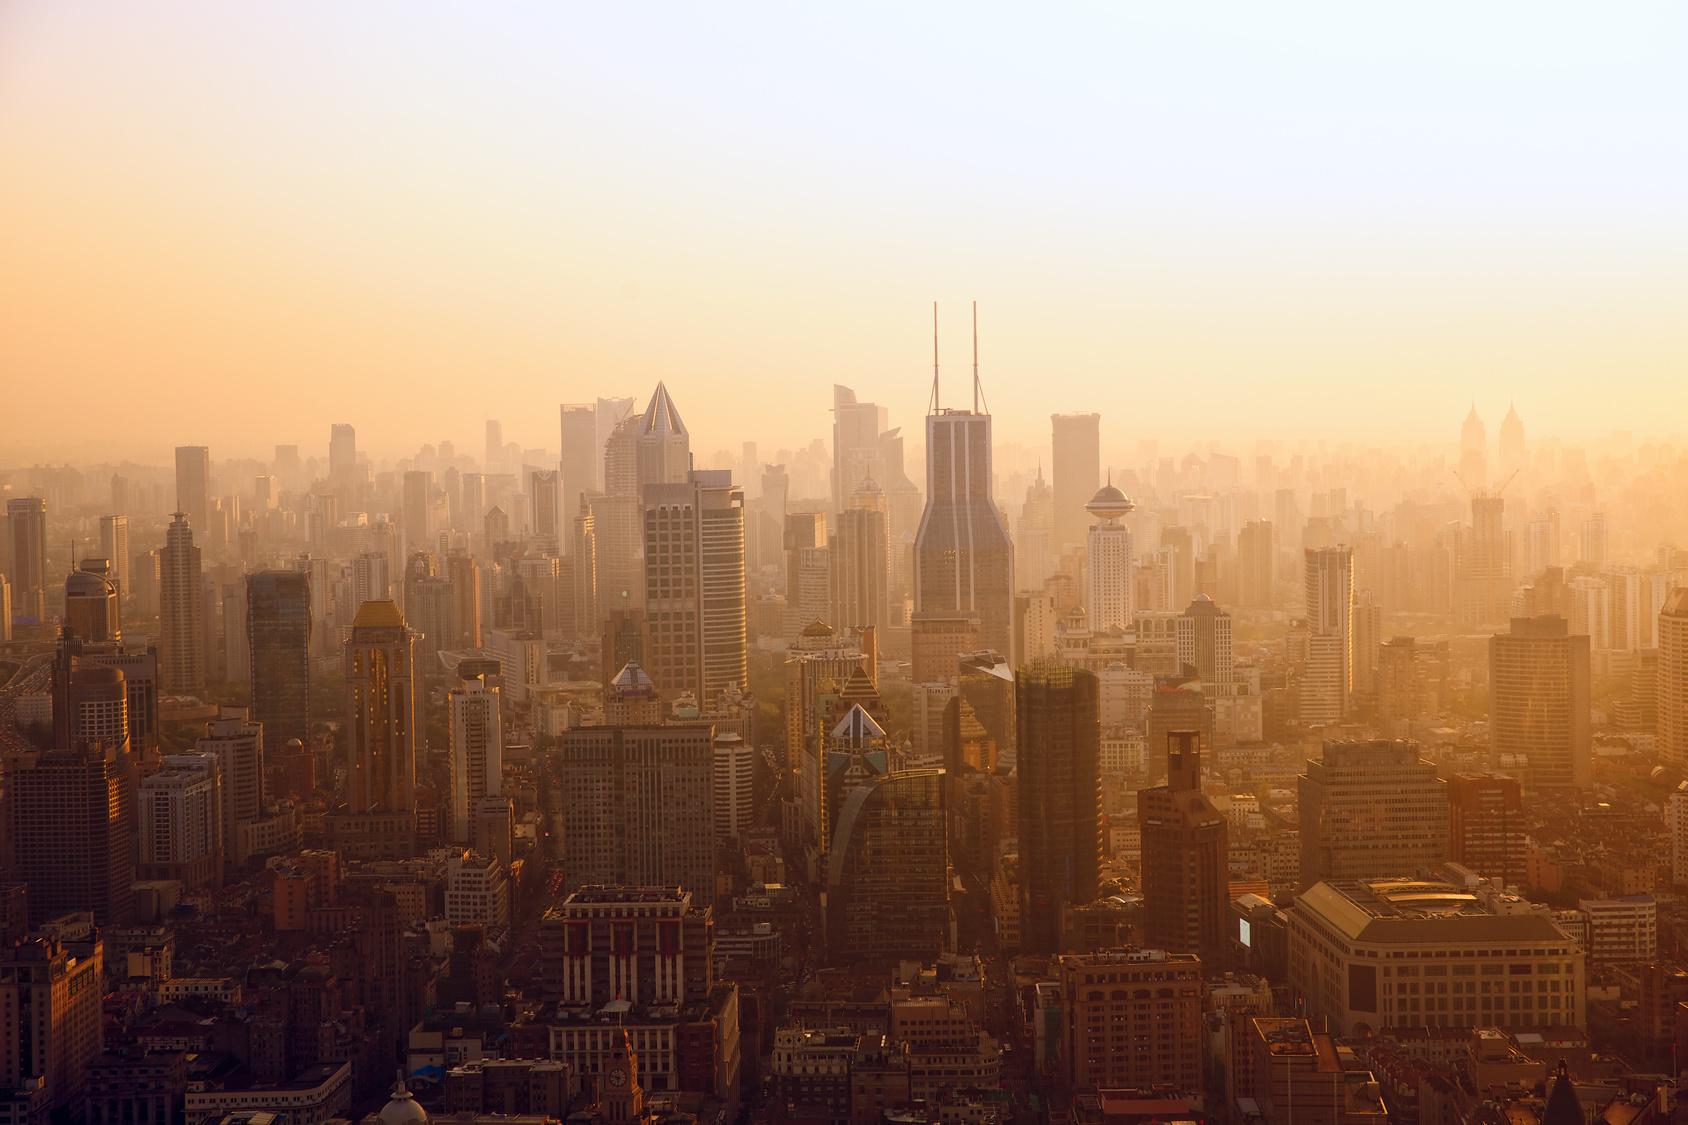 Smog during sunrise in Shanghai